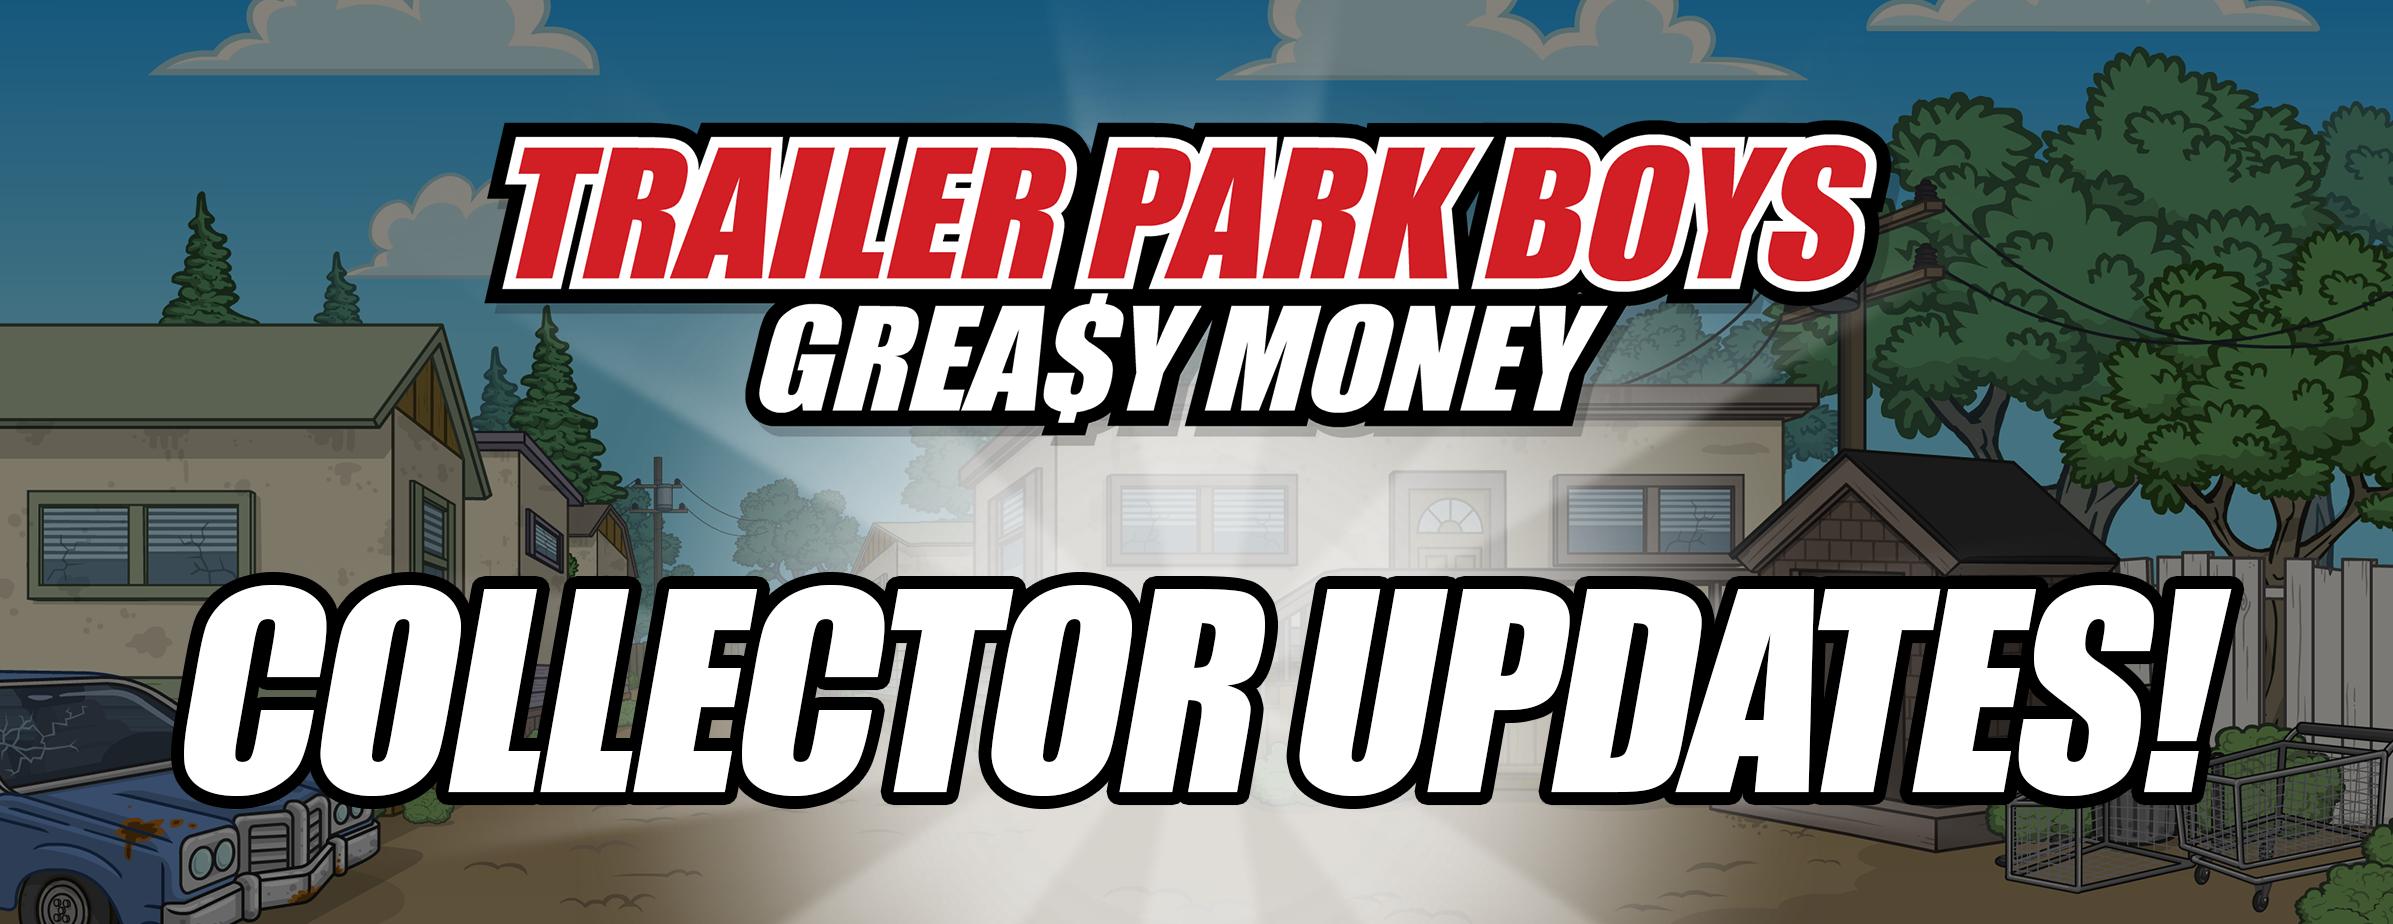 Trailer Park Boys: New Collectors